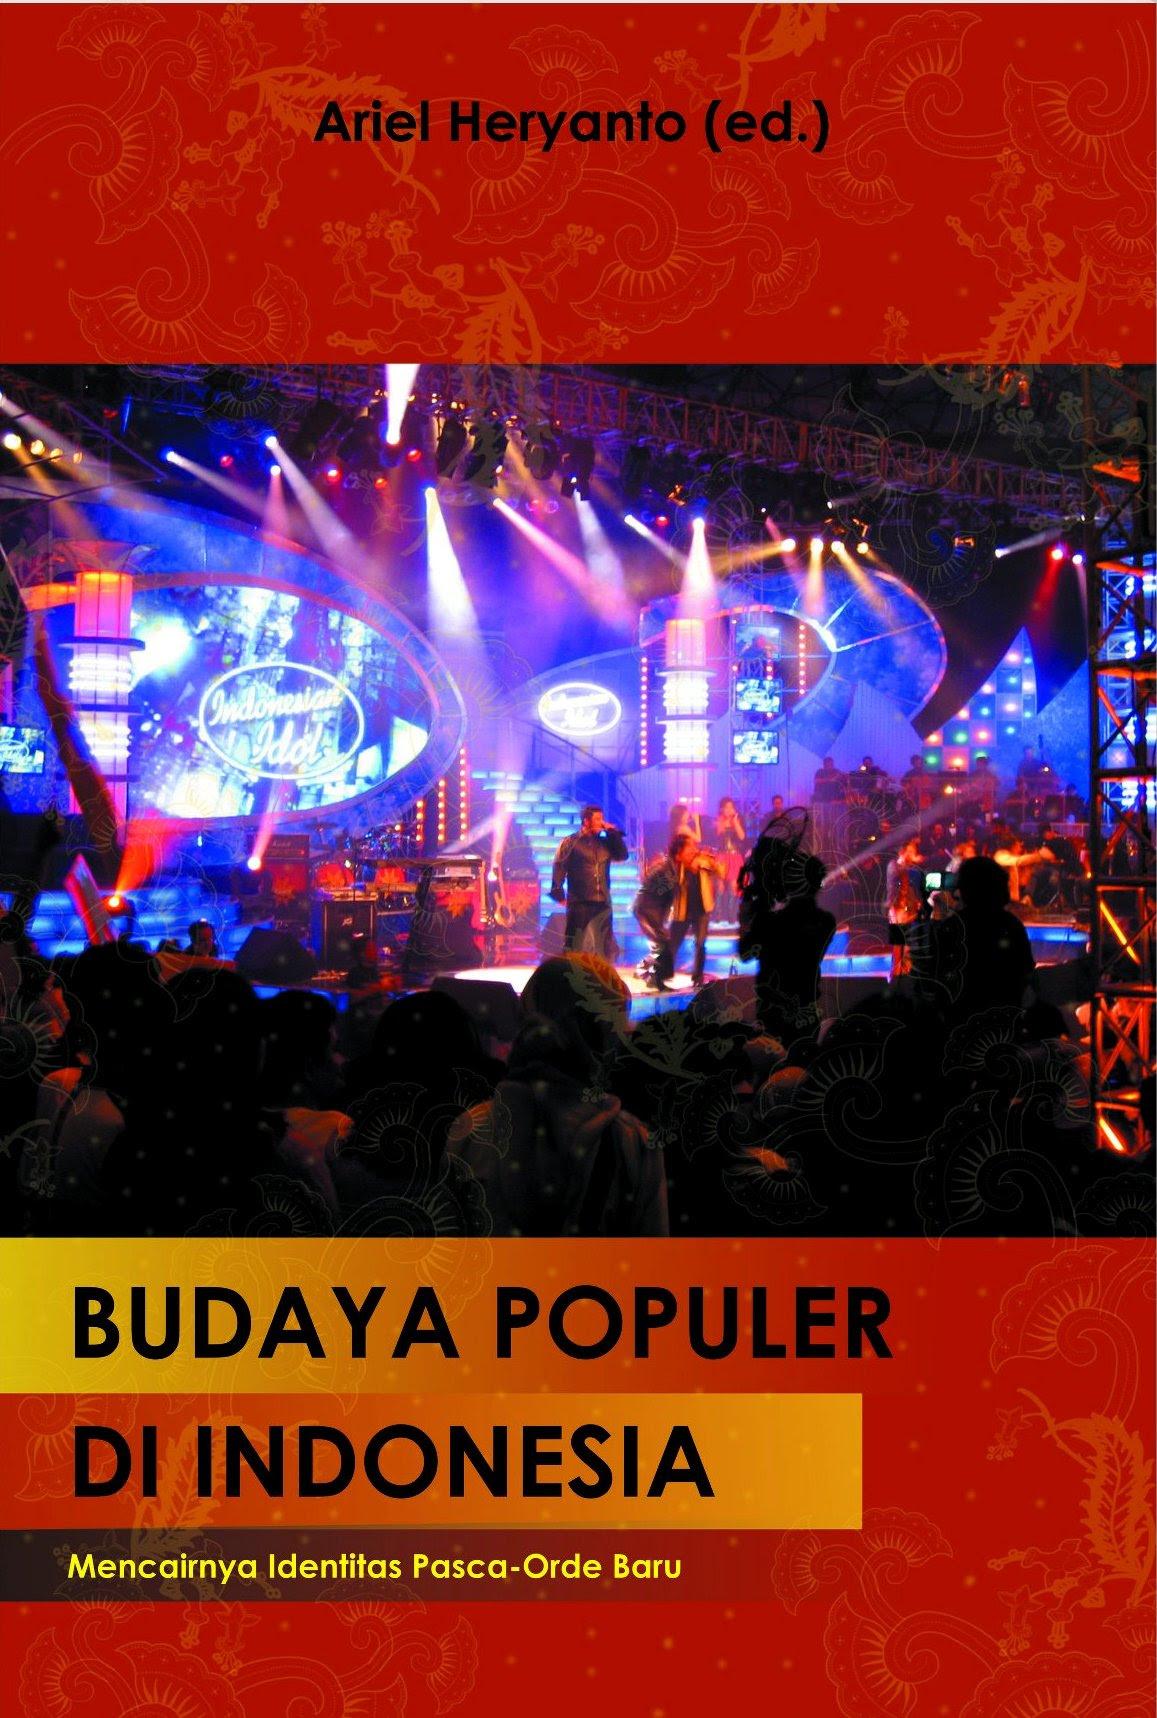 Potret Budaya Populer di Indonesia  wisnuprasetya